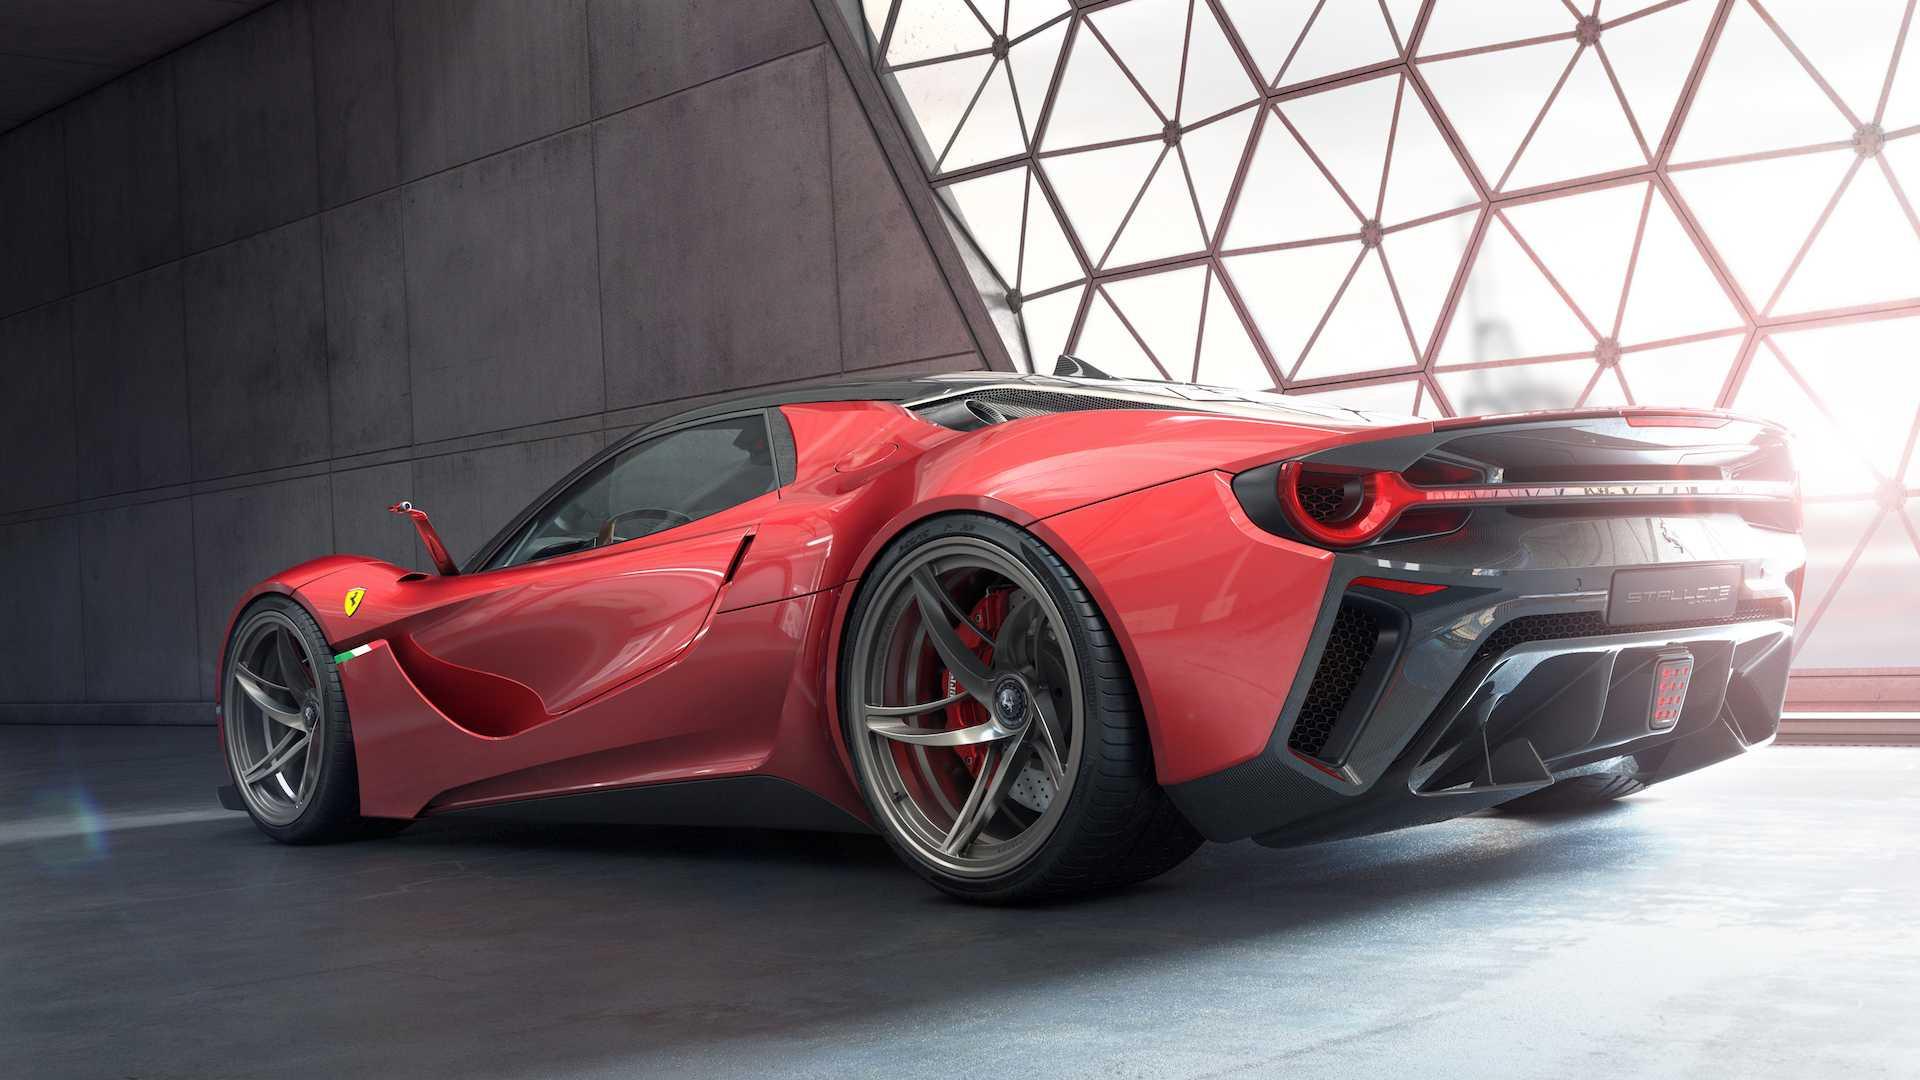 Ferrari Stallone Concept или достойный преемник гибридного LaFerrari